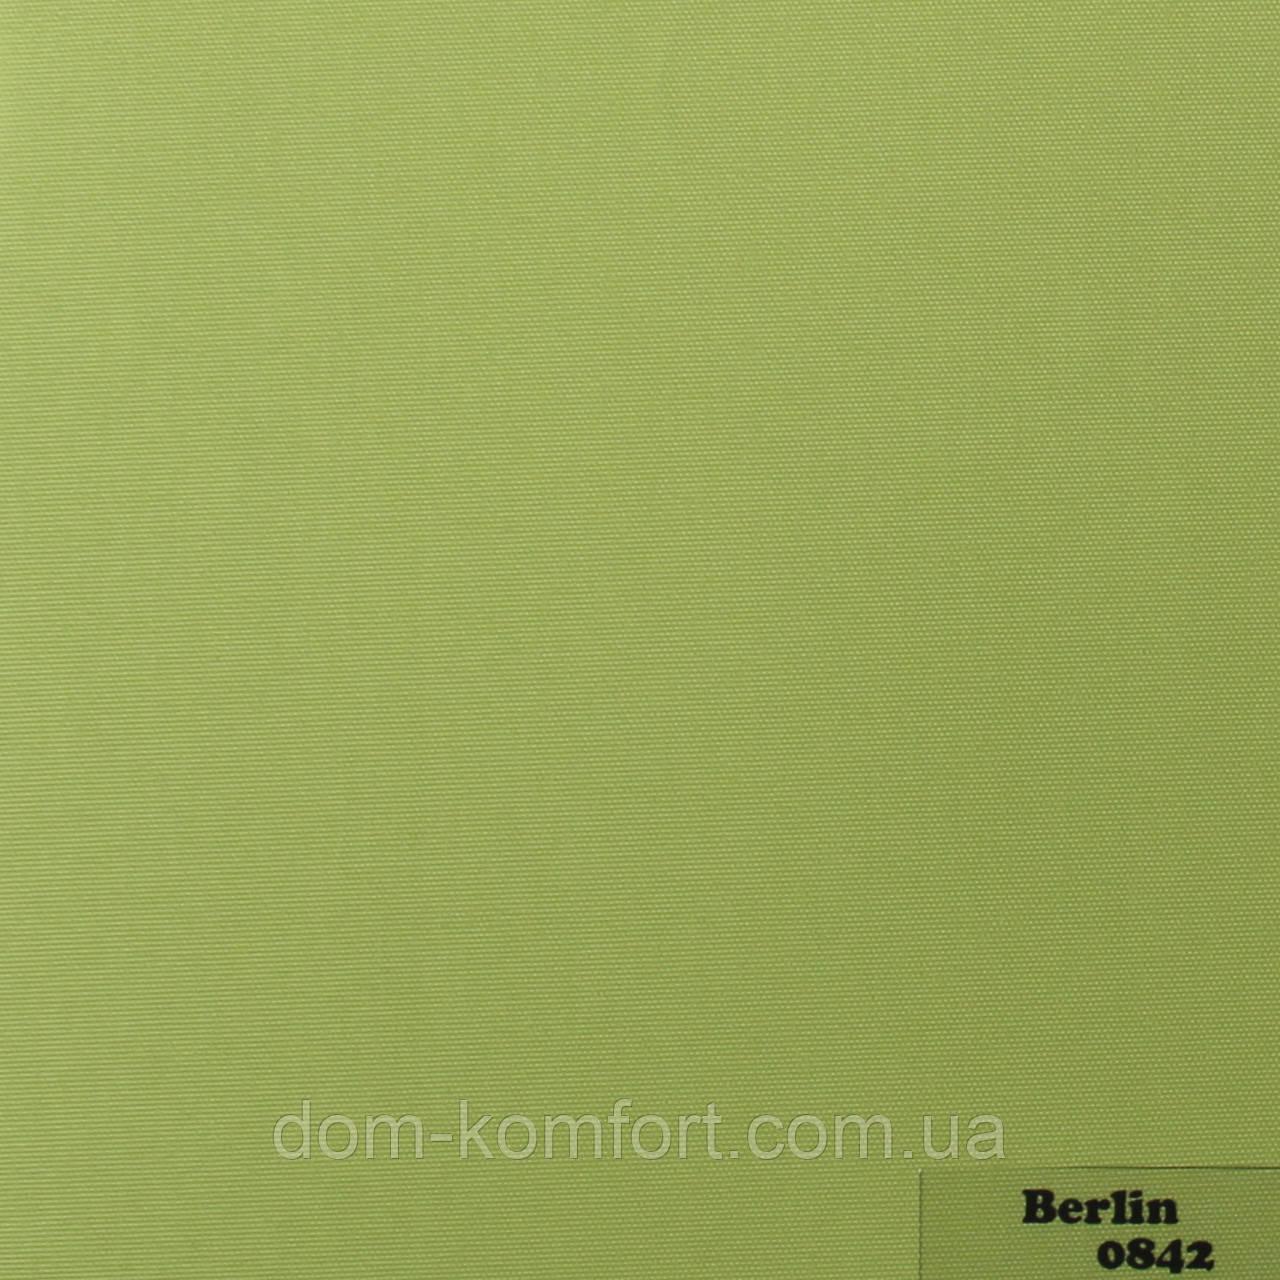 Рулонные шторы Ткань Берлин Зелёный Лист 0842